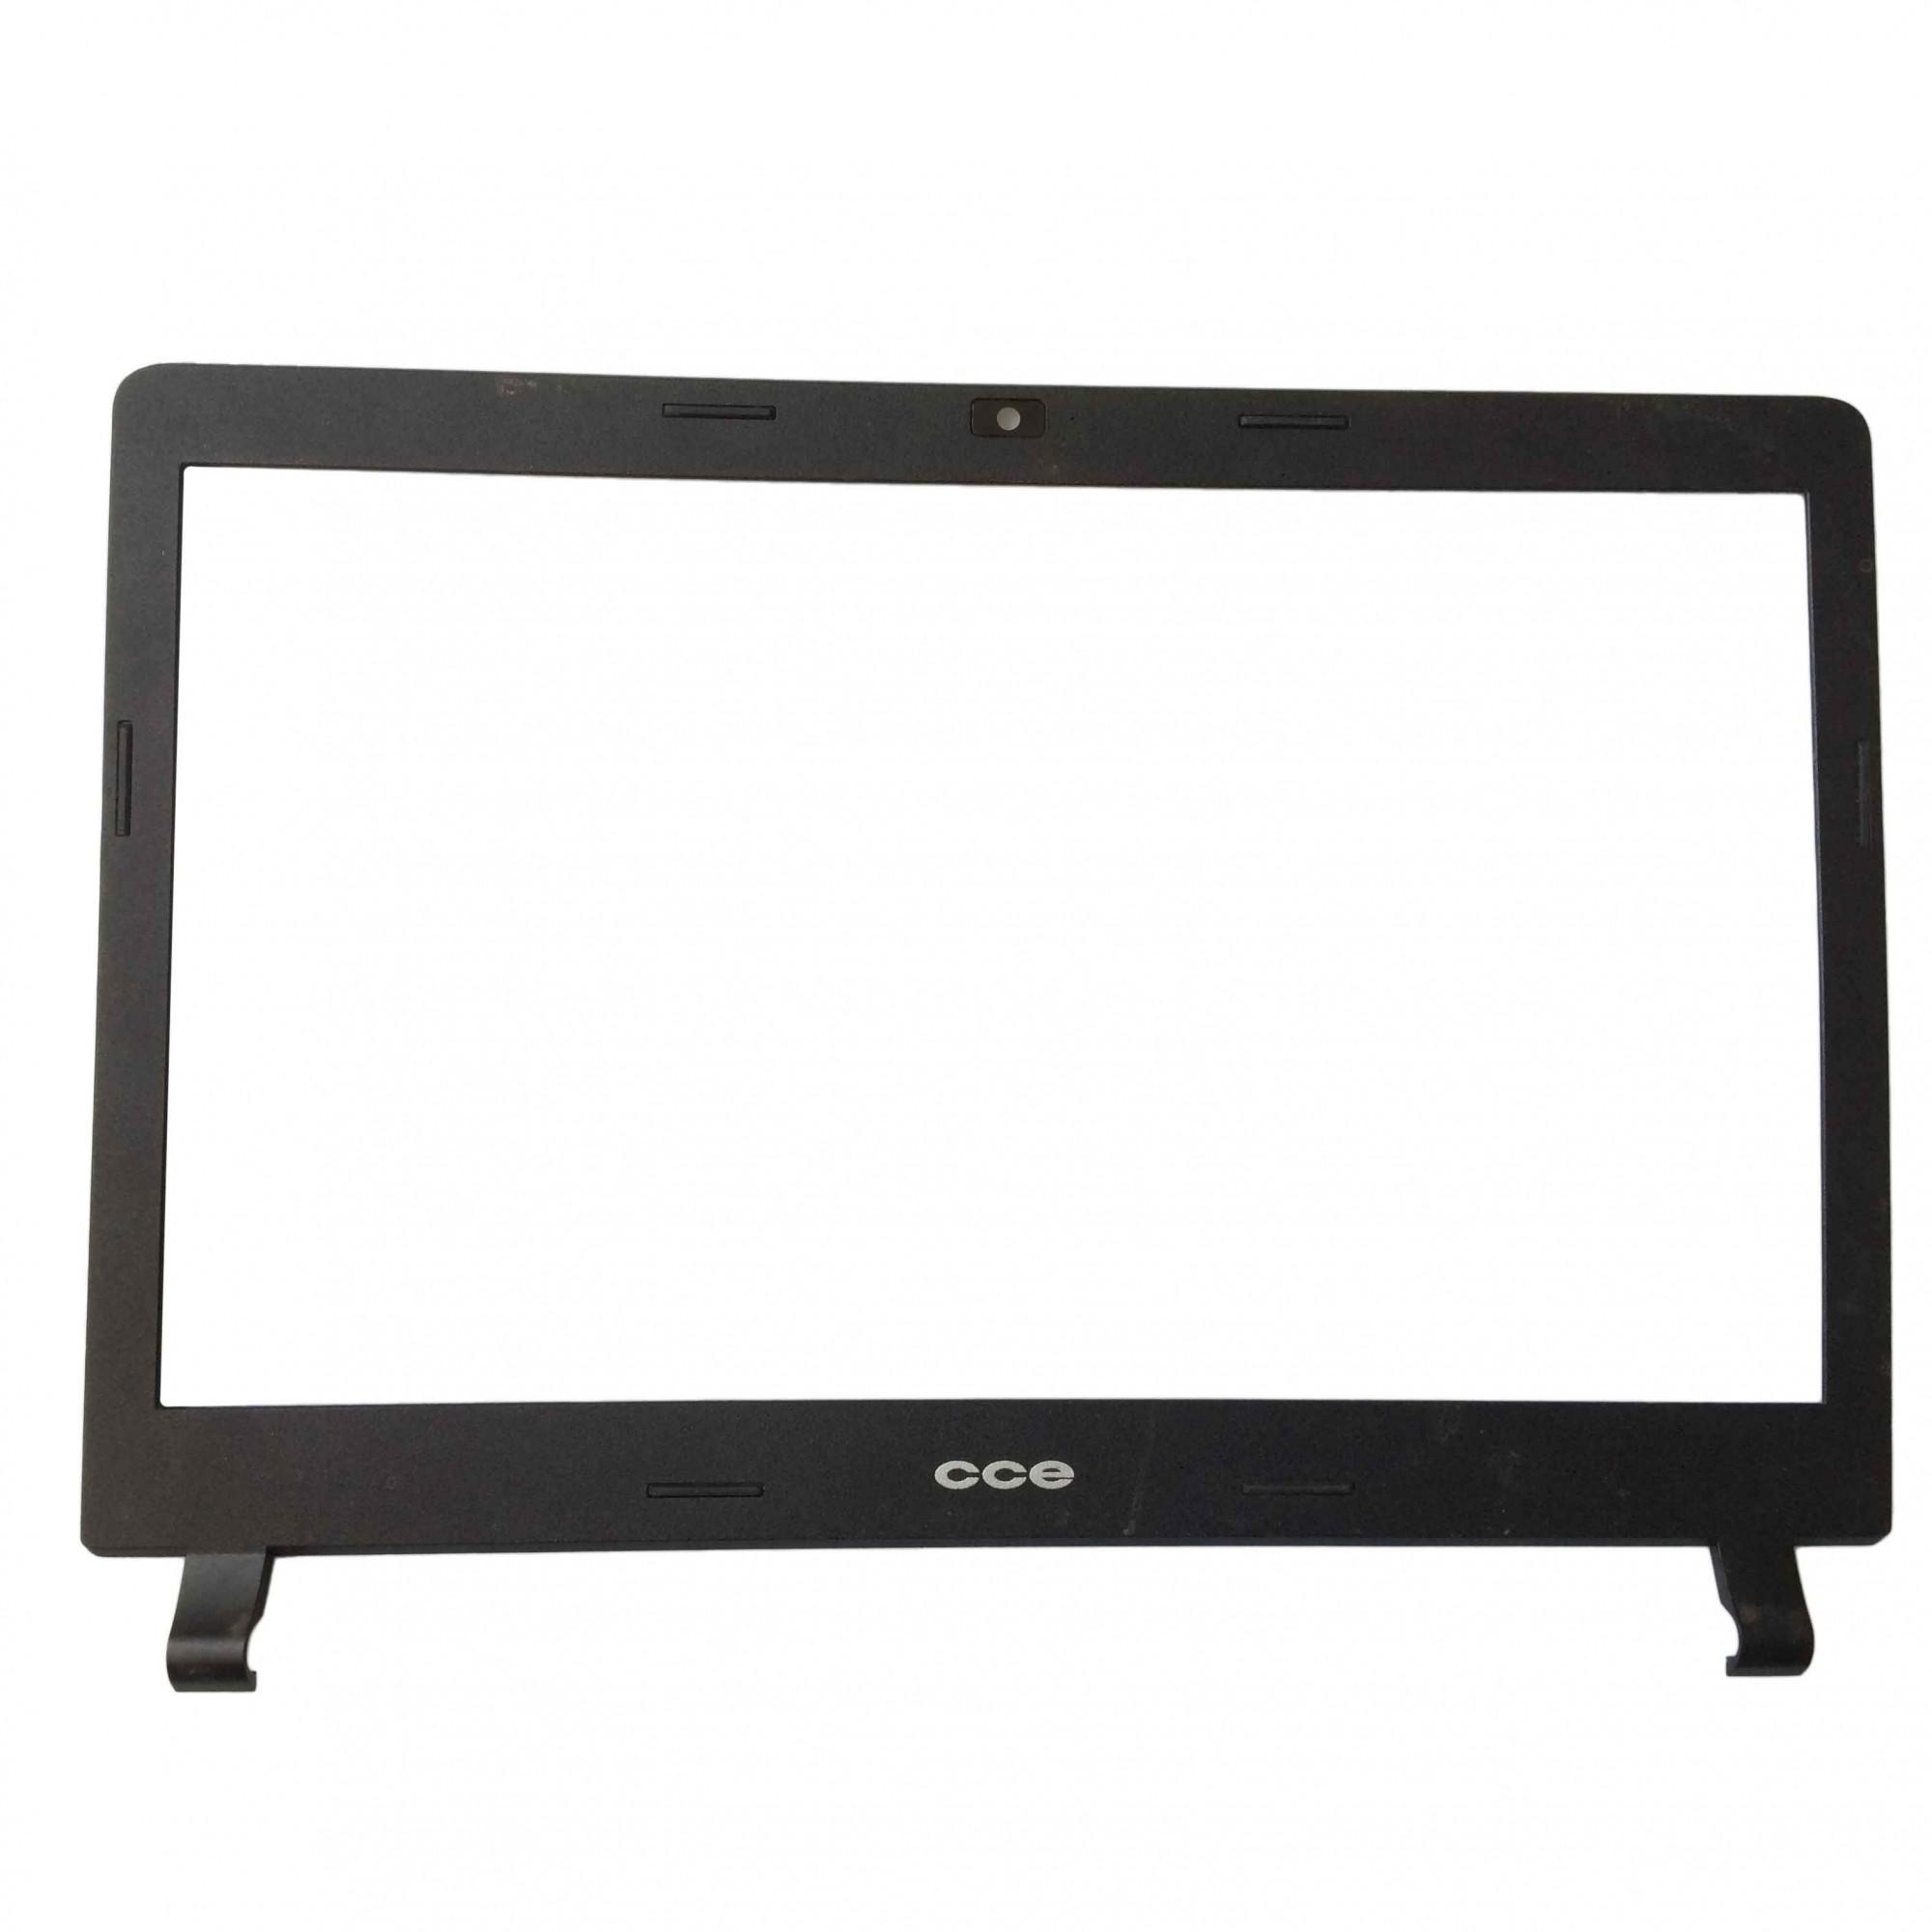 Moldura Tela LCD Notebook Cce Win U25 U25l PN:62rph43b12a1101 - Retirado